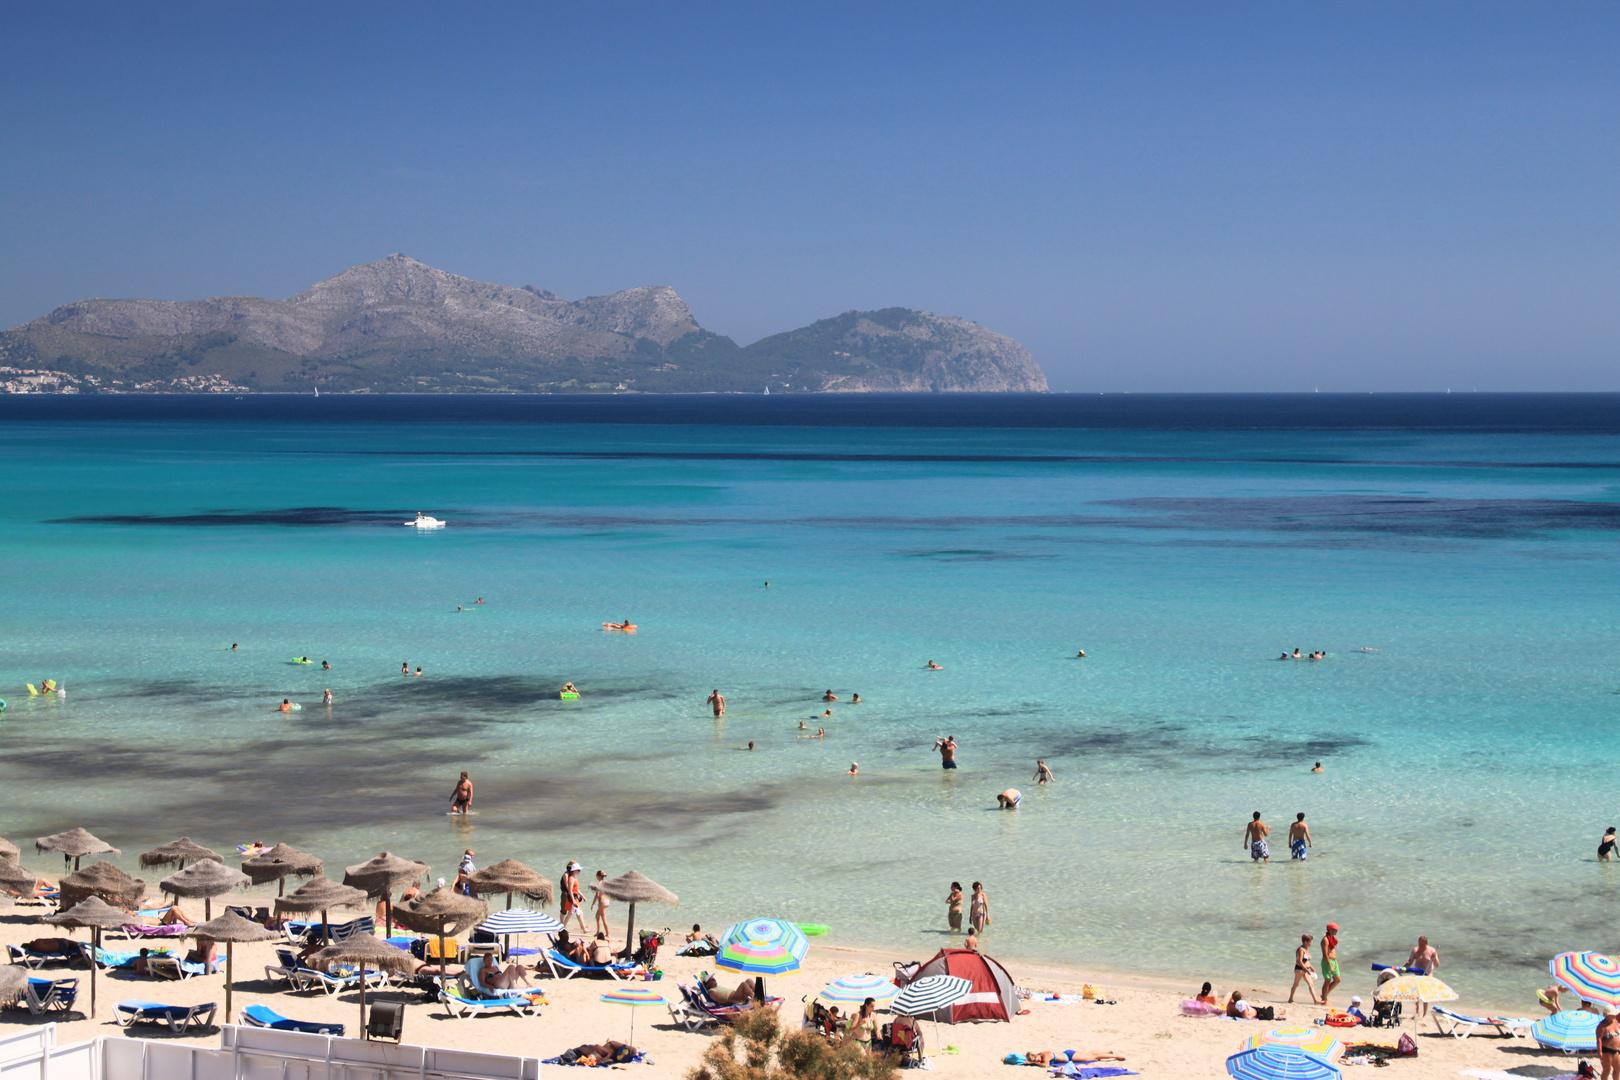 Strand von Mallorca